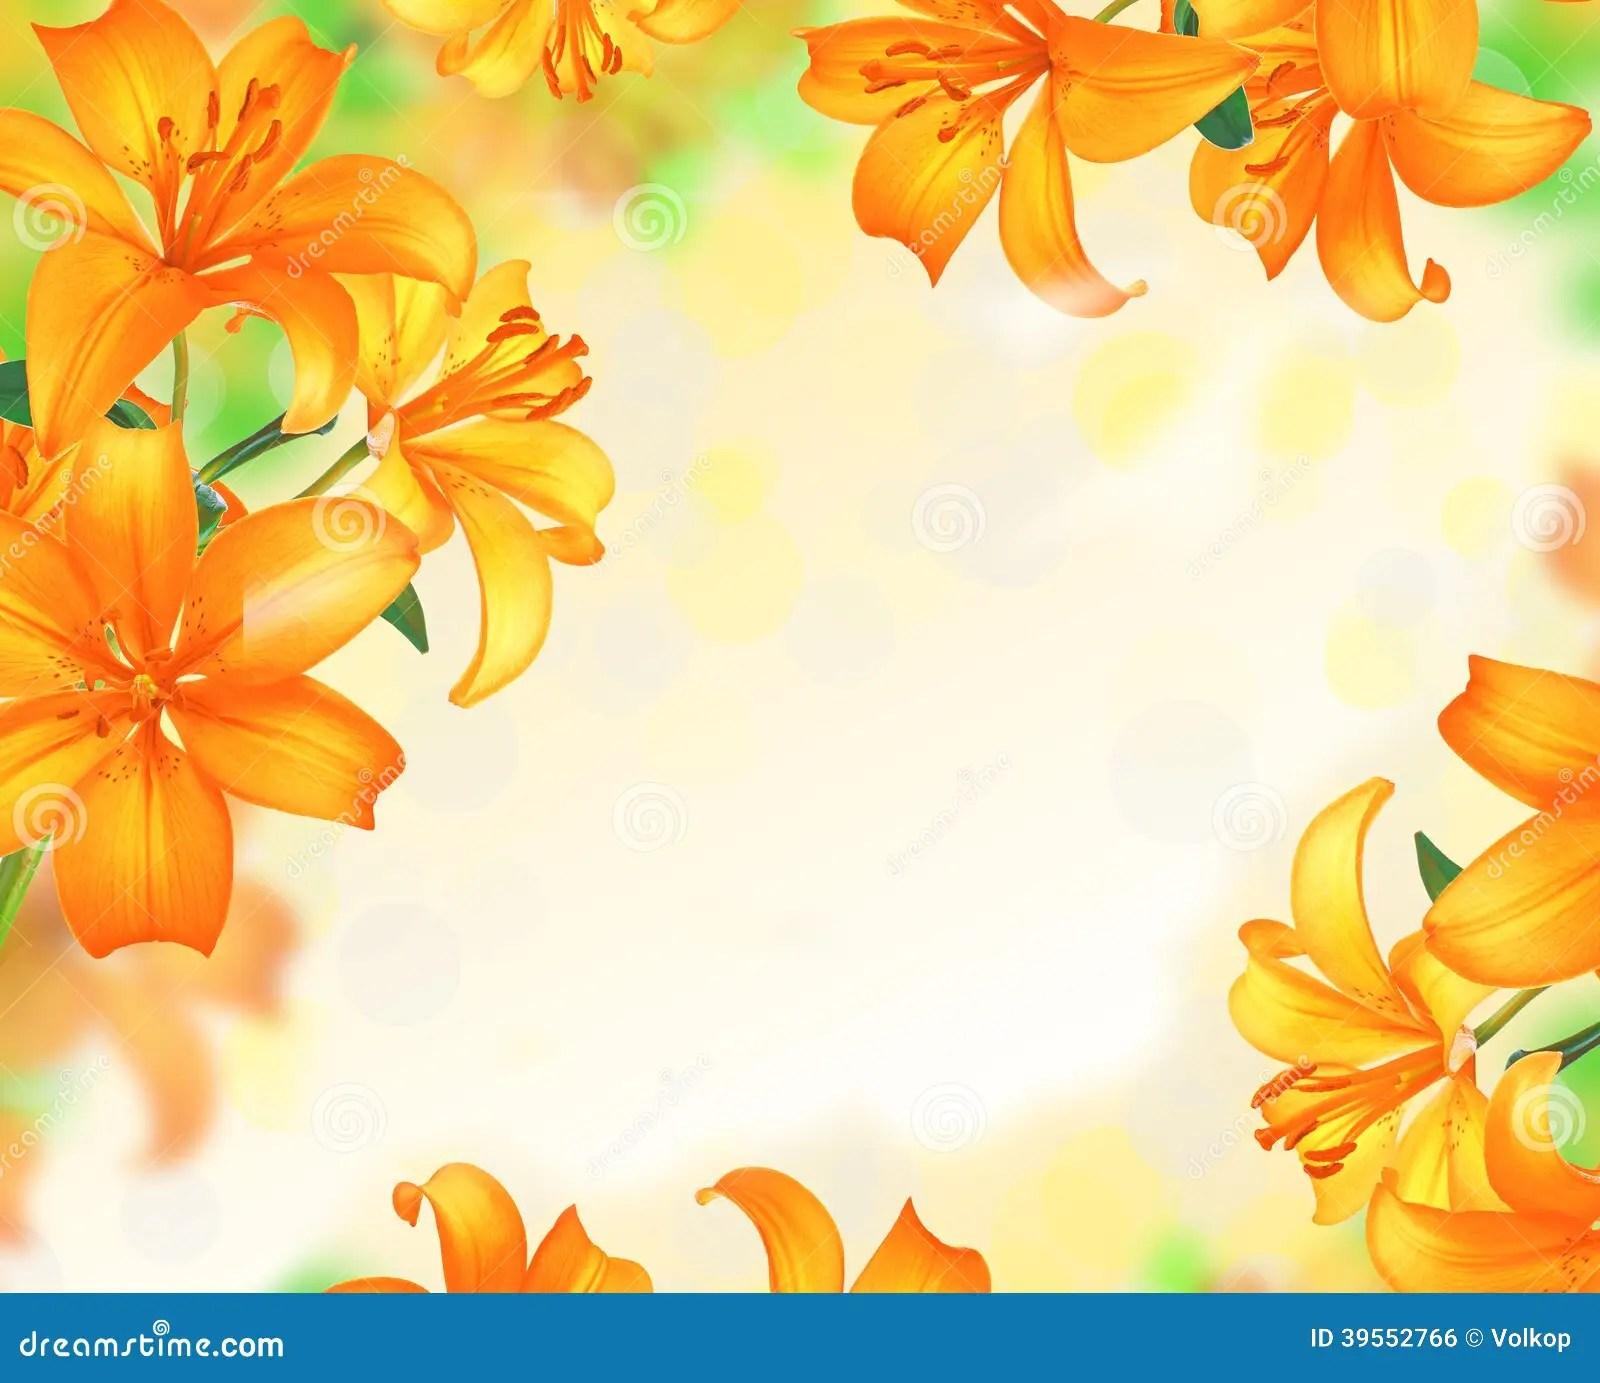 Lily Flowers Gransdesign Arkivfoto Bild Av Boris Blomma